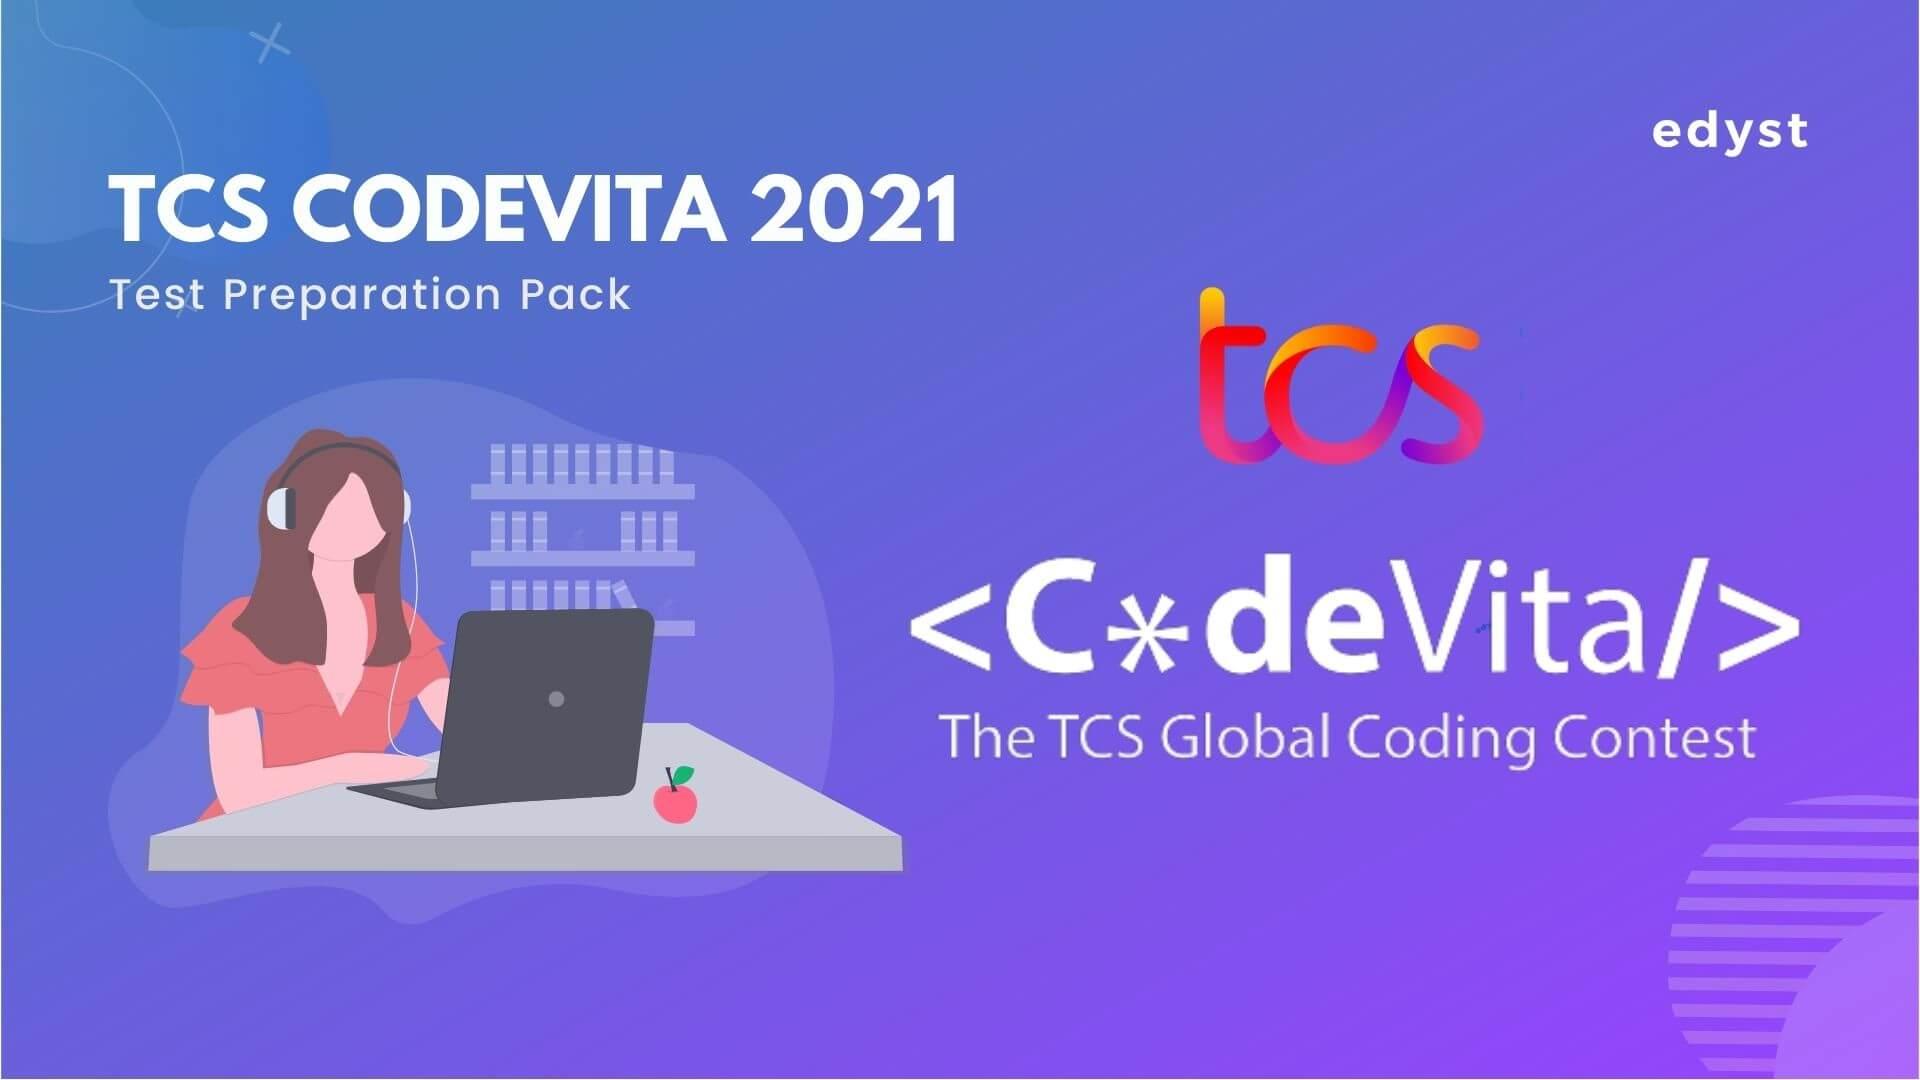 TCS CodeVita 2021 Test Preparation Pack